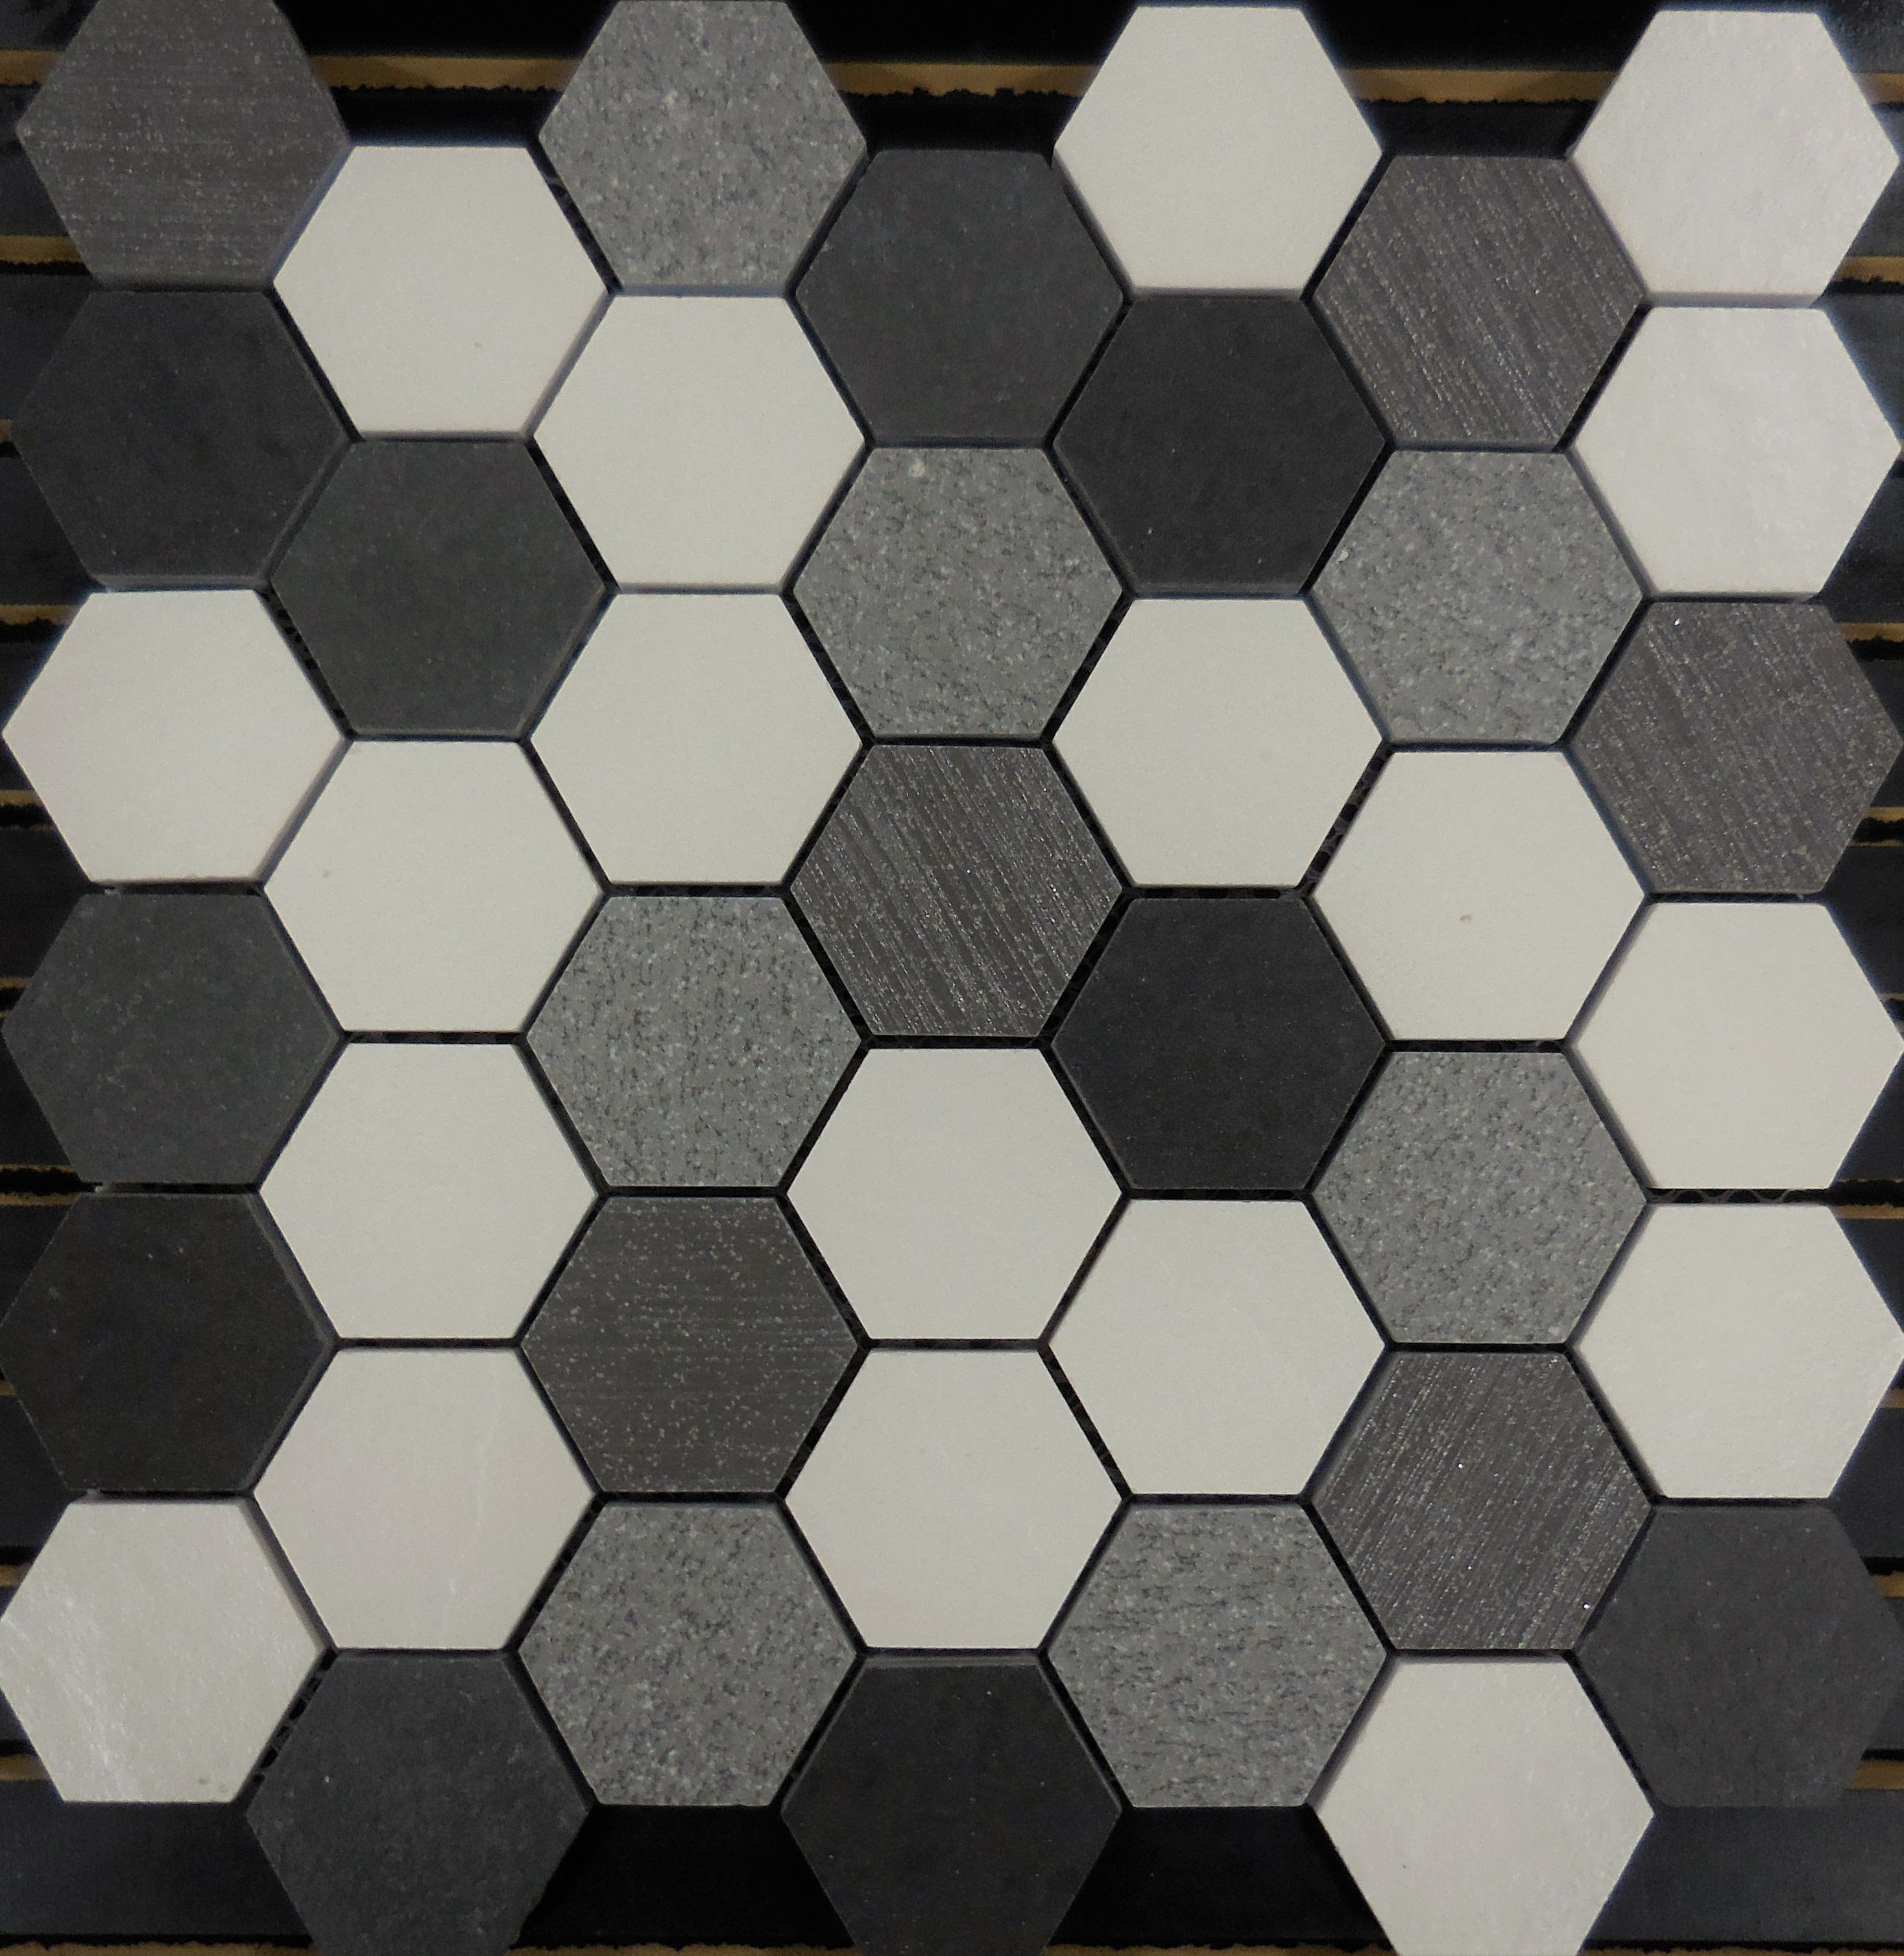 Pth7017 Porcelain Mosaic Salt N Pepper Hexagon Schillings